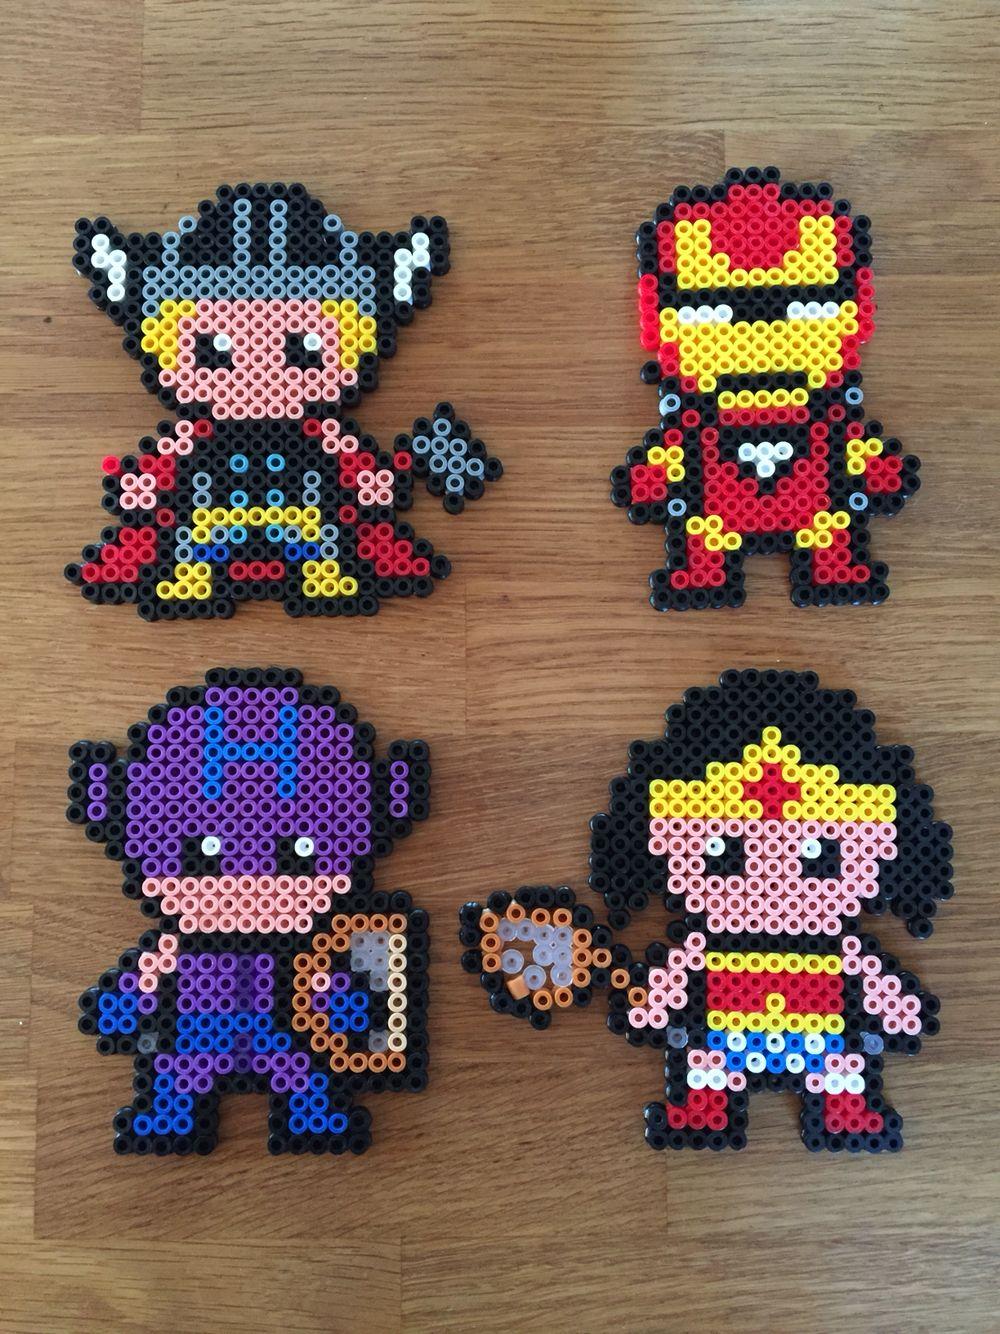 How to Use Adobe Fuse to Create a Superhero Reference - iDevie   Superhero Fuse